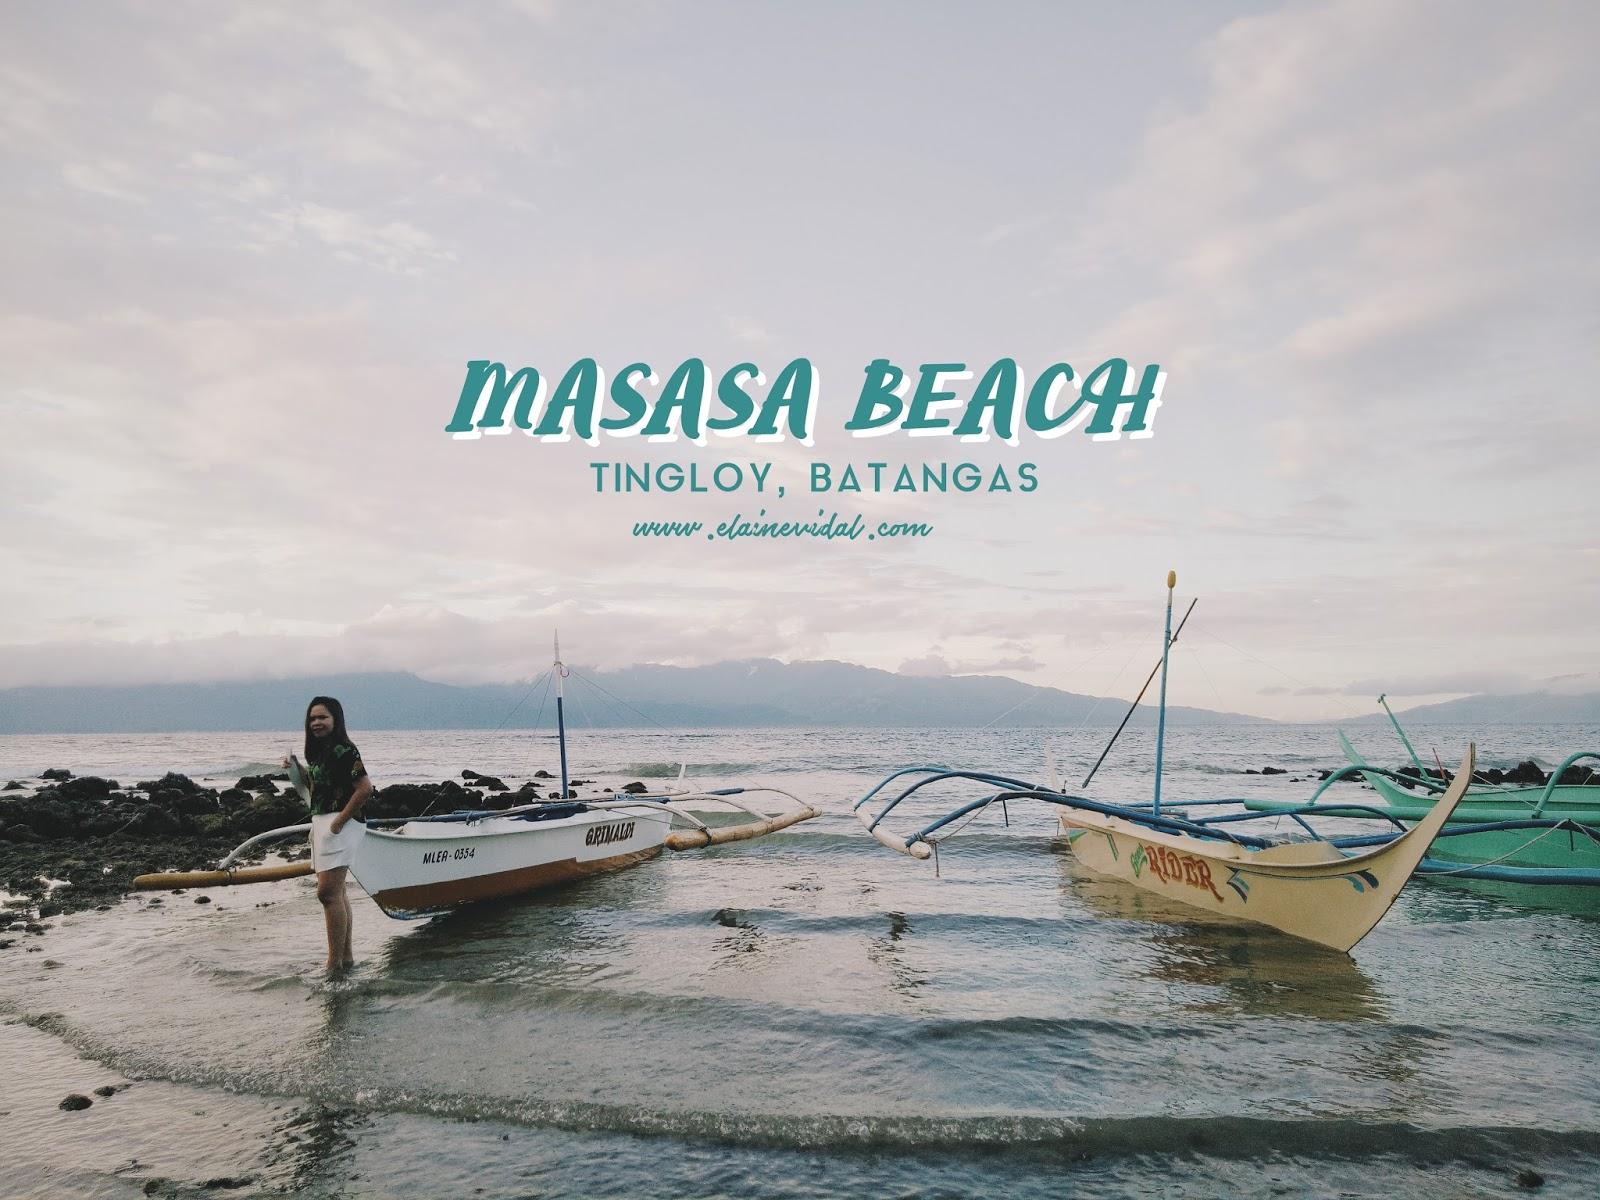 Masasa Beach 1